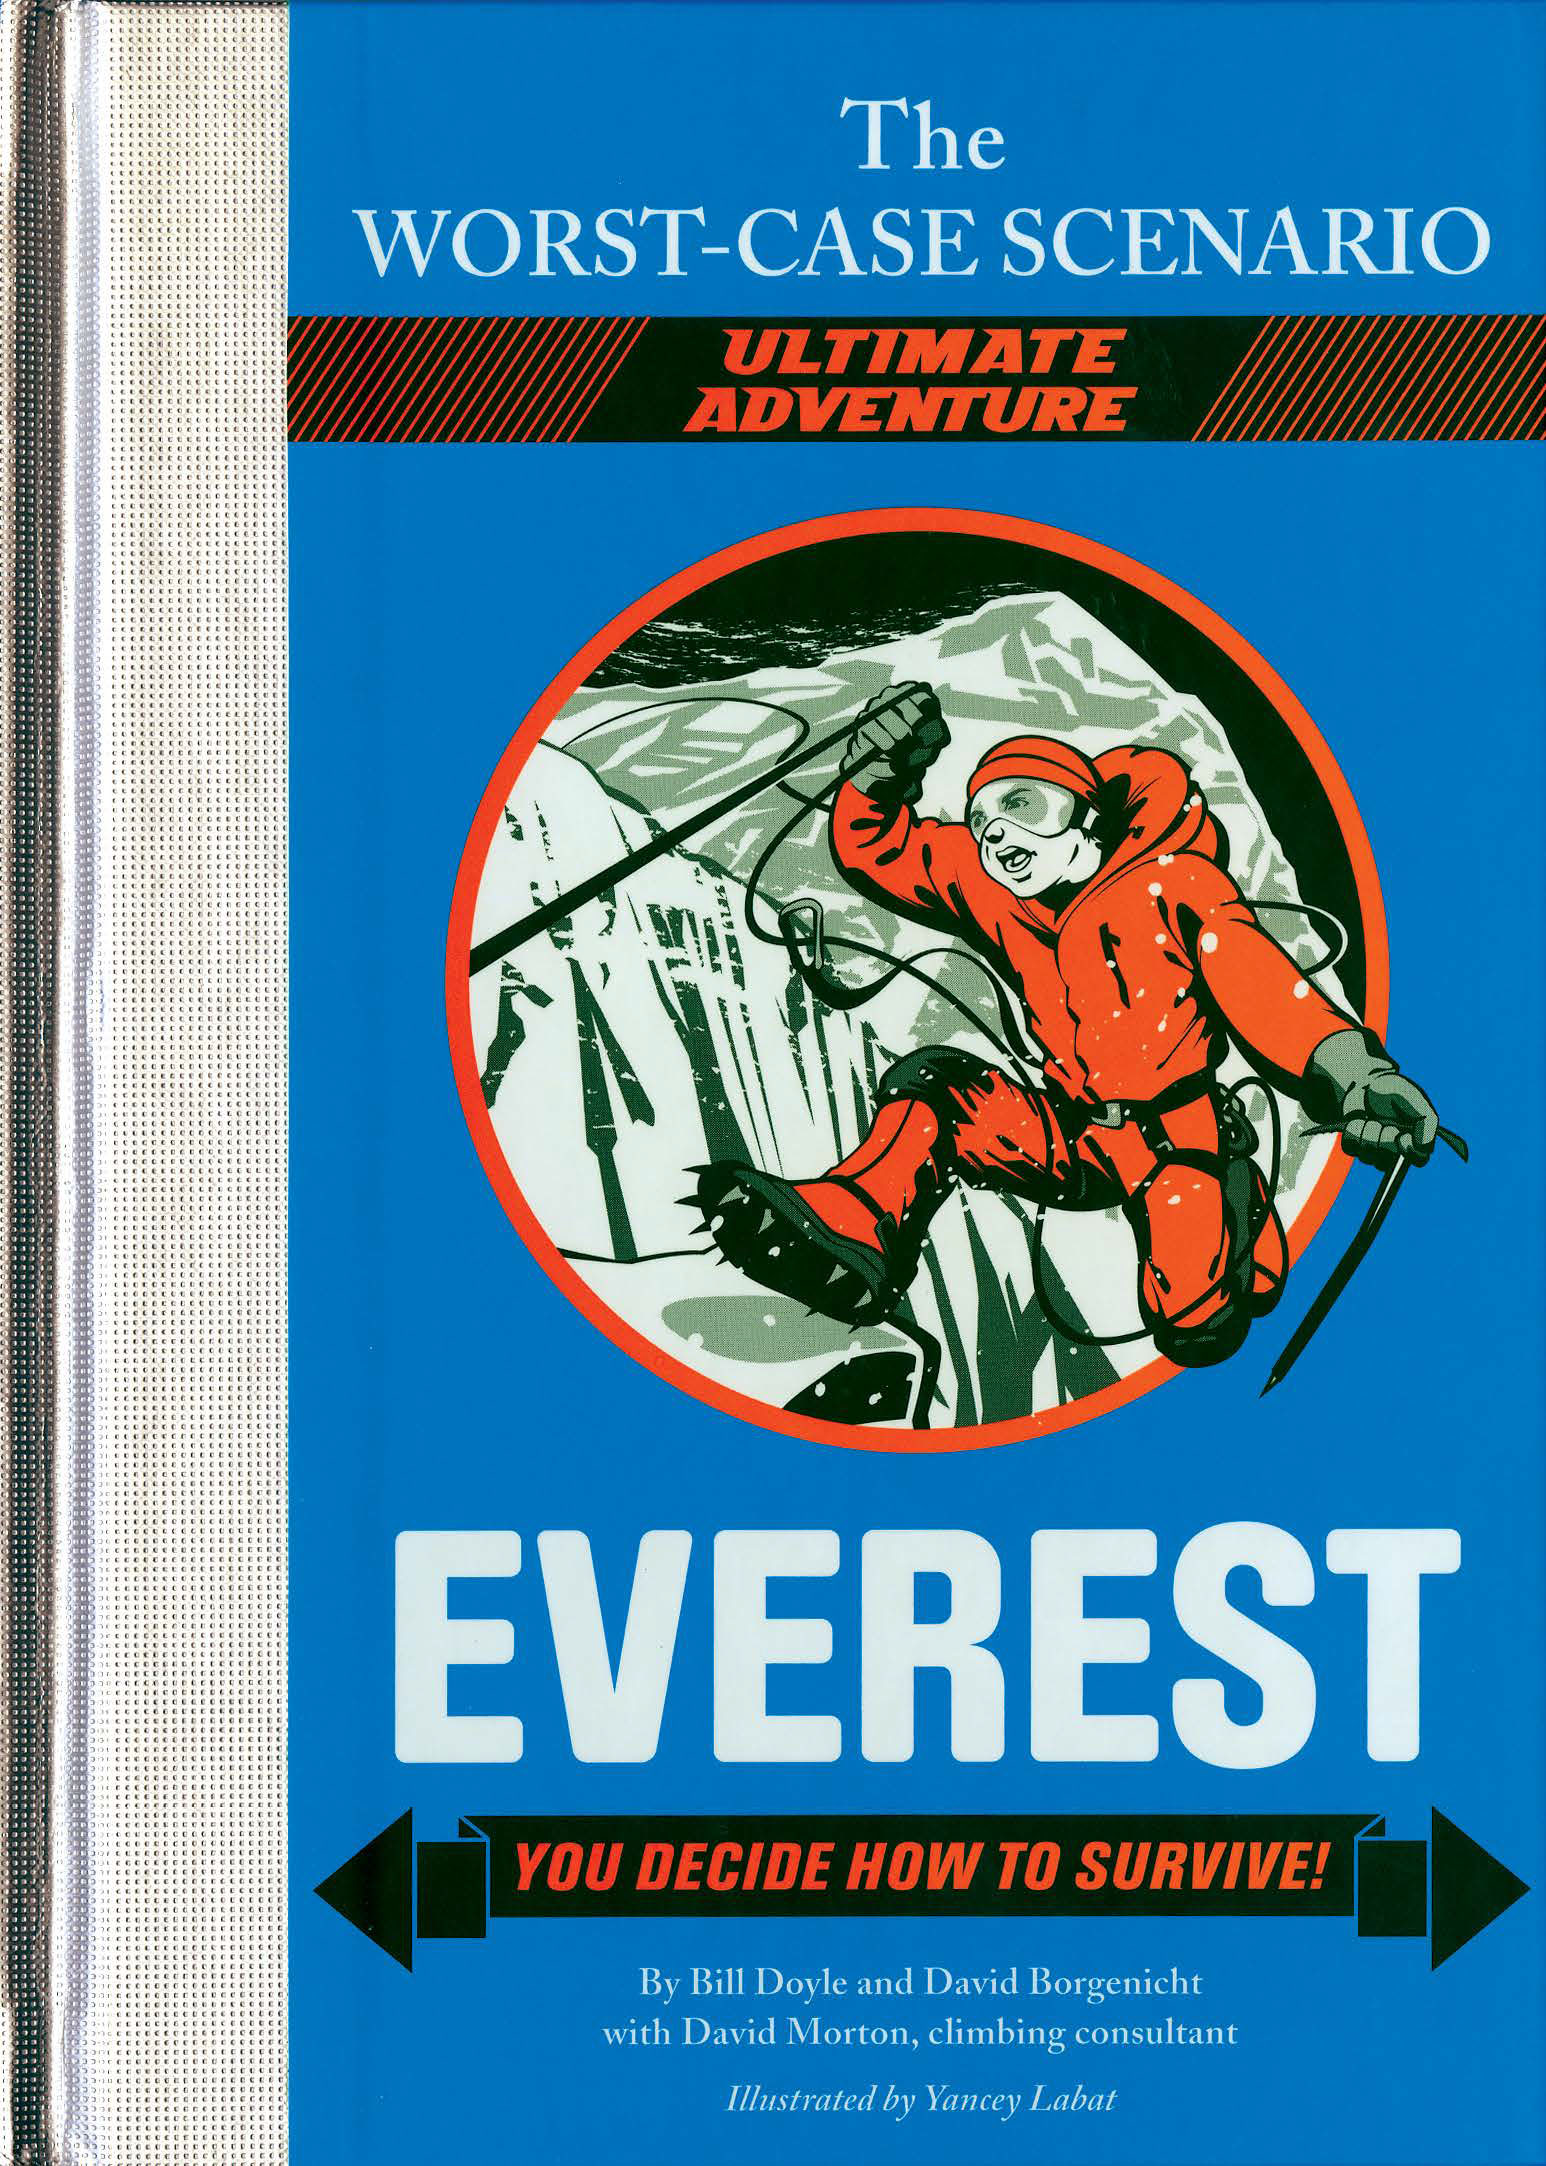 WCS Everest-1.jpg